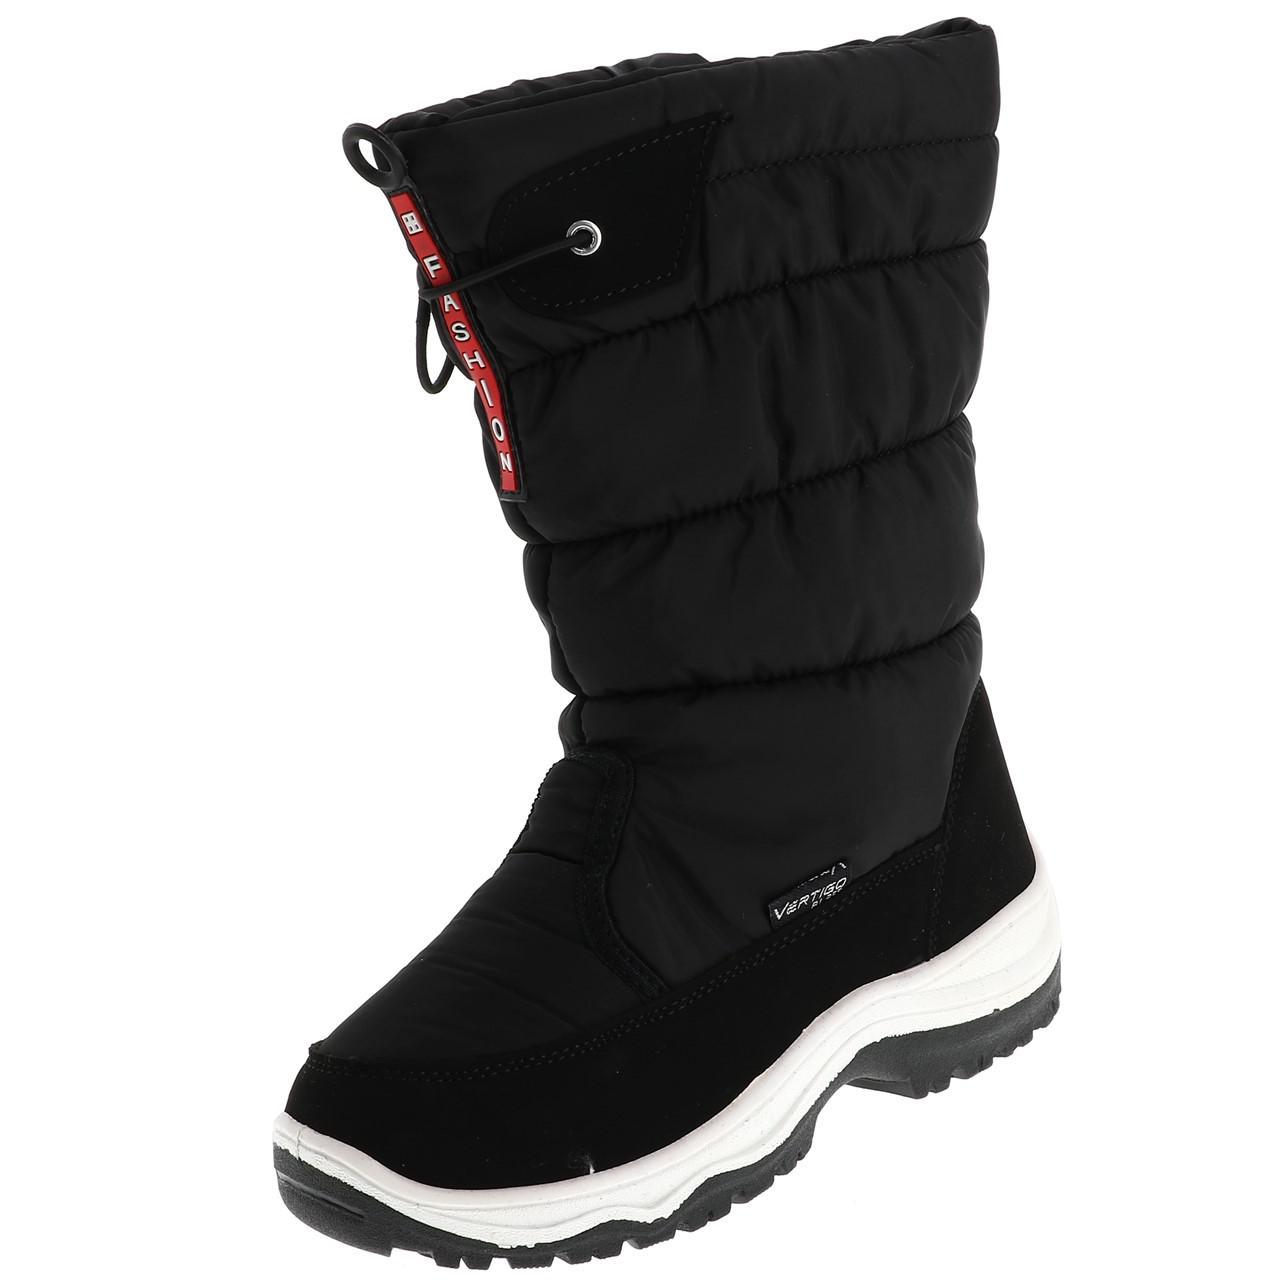 Bottes-neige-apres-ski-Alpes-vertigo-Listo-noir-boots-l-Noir-14439-Neuf